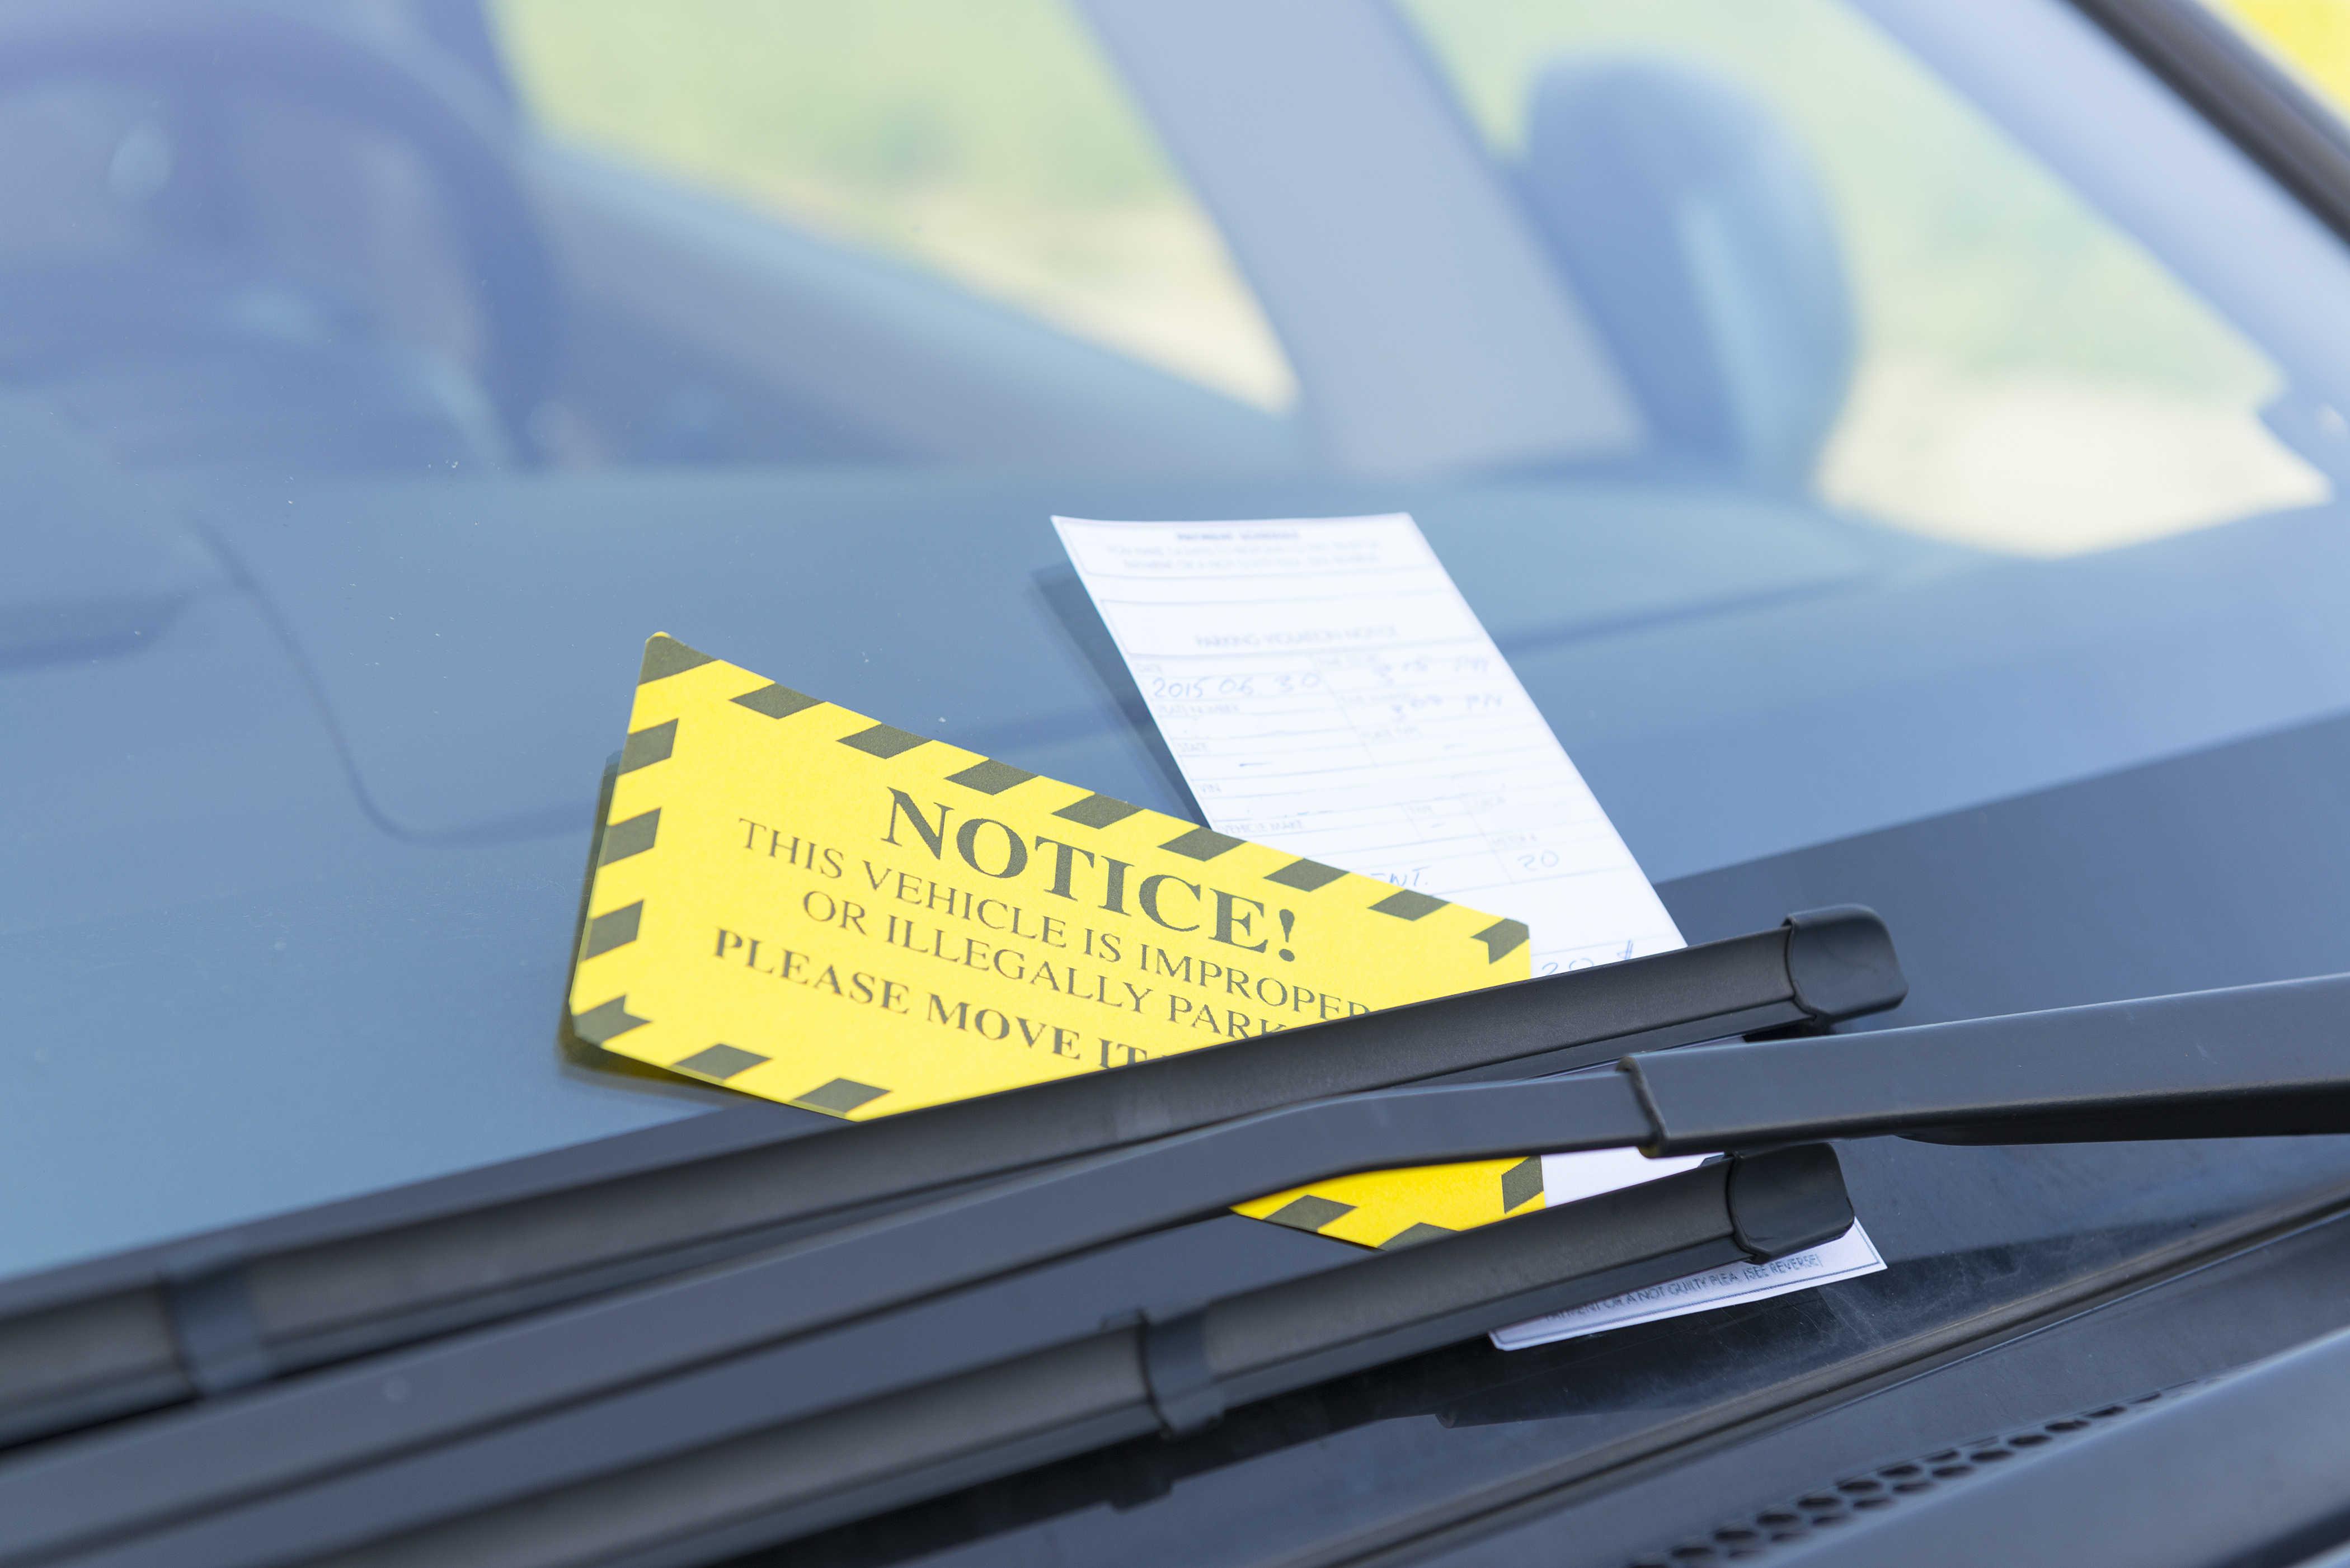 Раскладка визиток под дворники авто